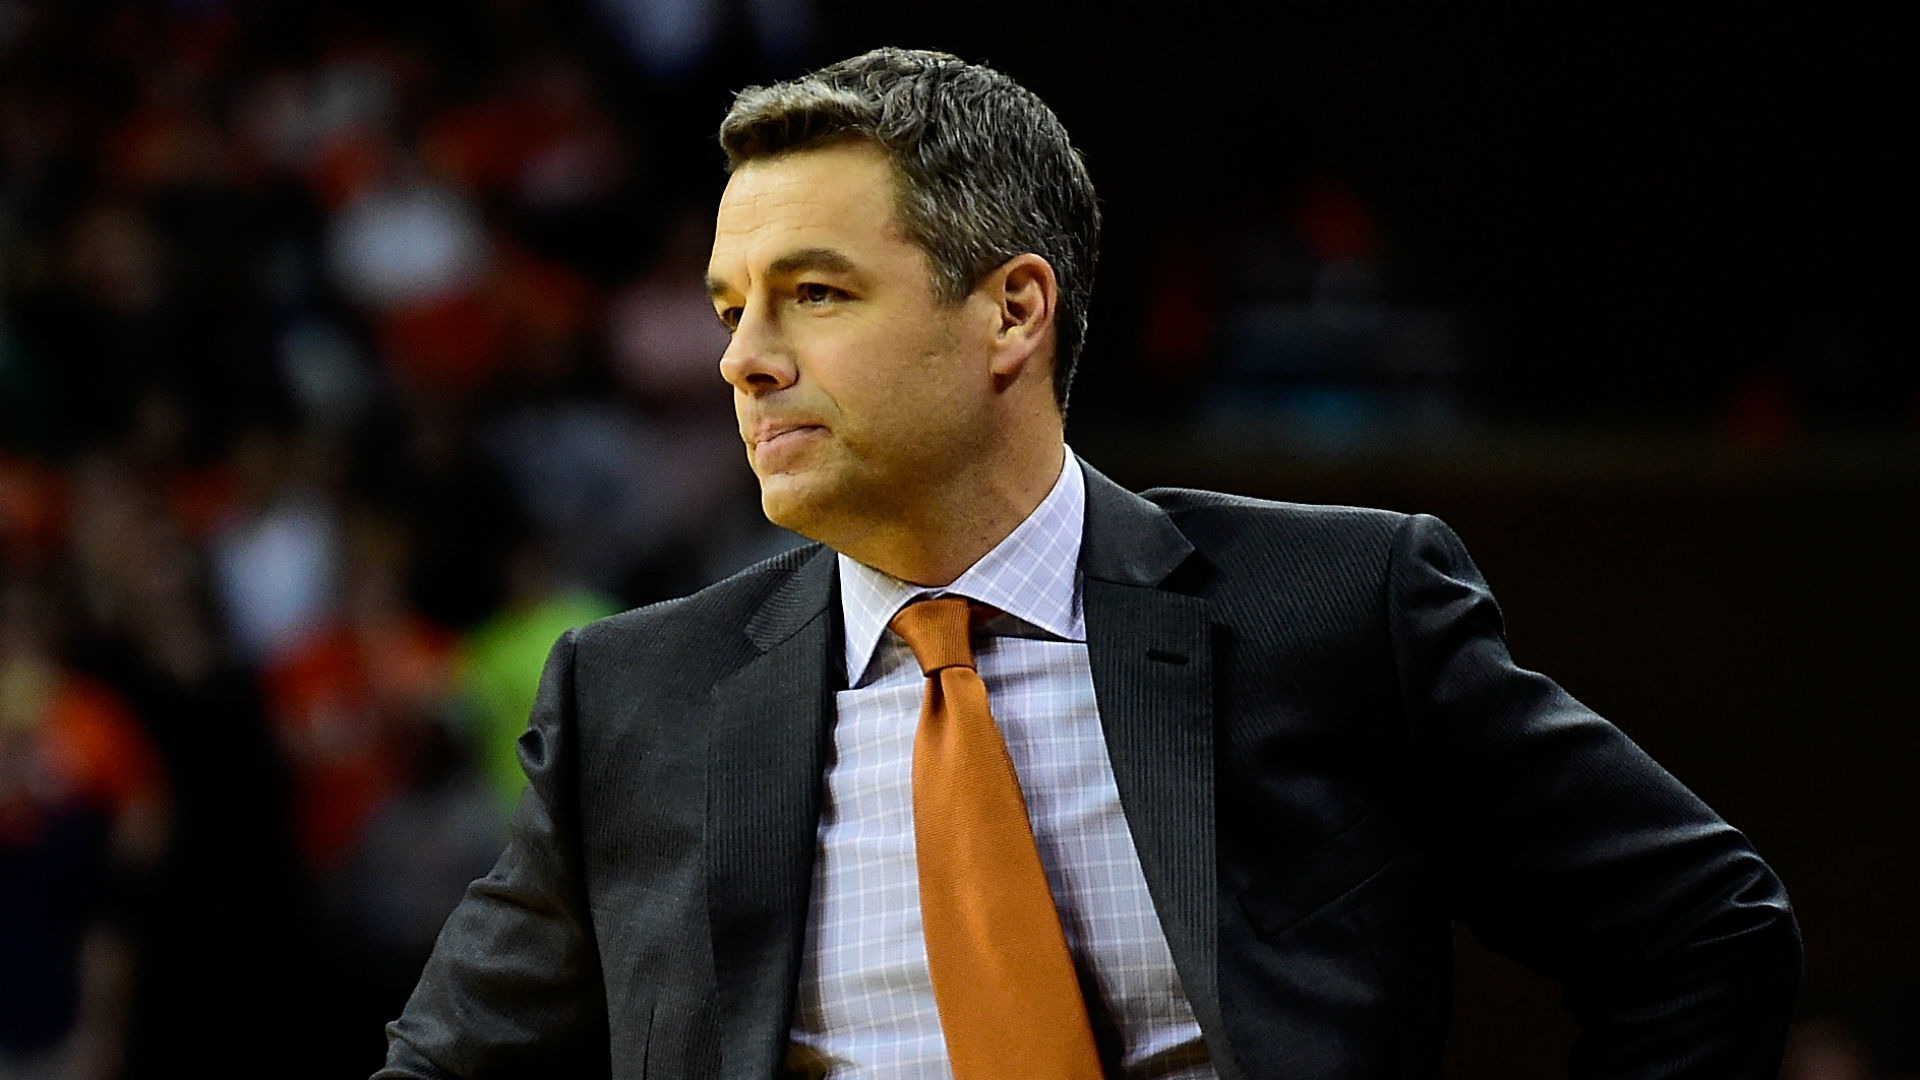 Virginia coach Tony Bennett turns down raise, instead invests $500K in program